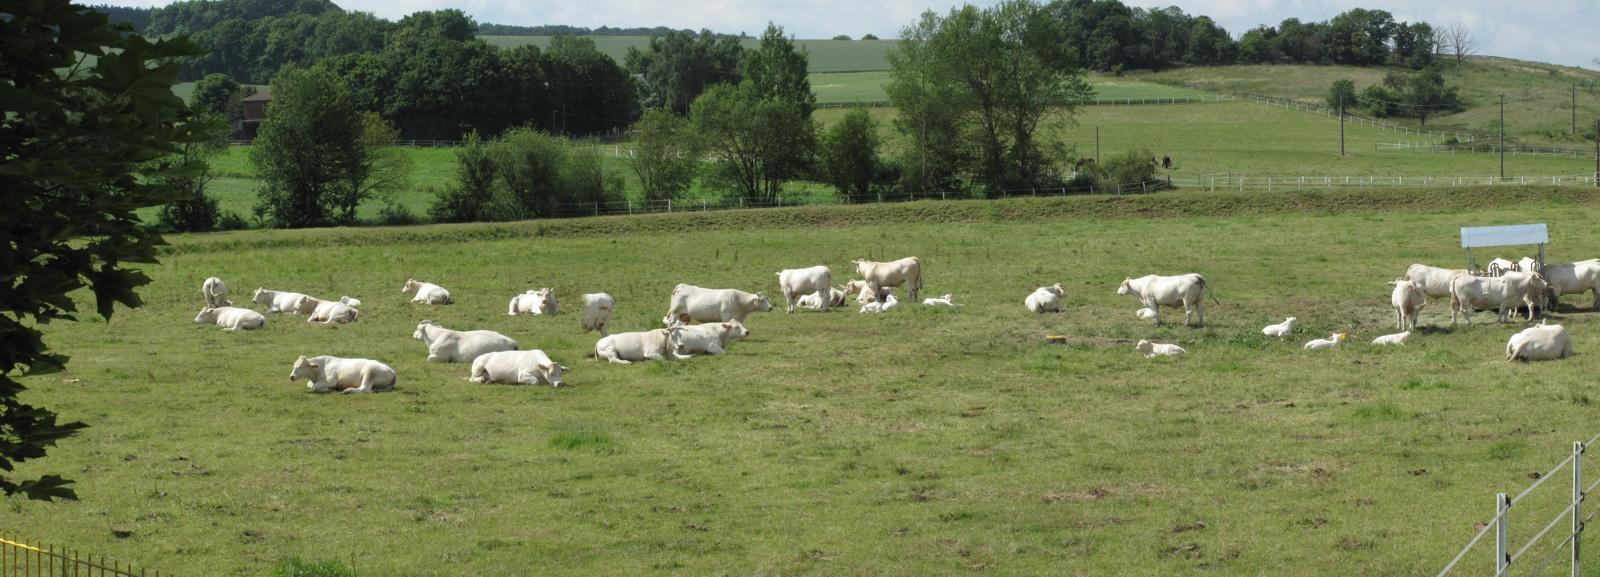 Charolais-Rinder Betrieb Lehmler aus Katzenelnbogen